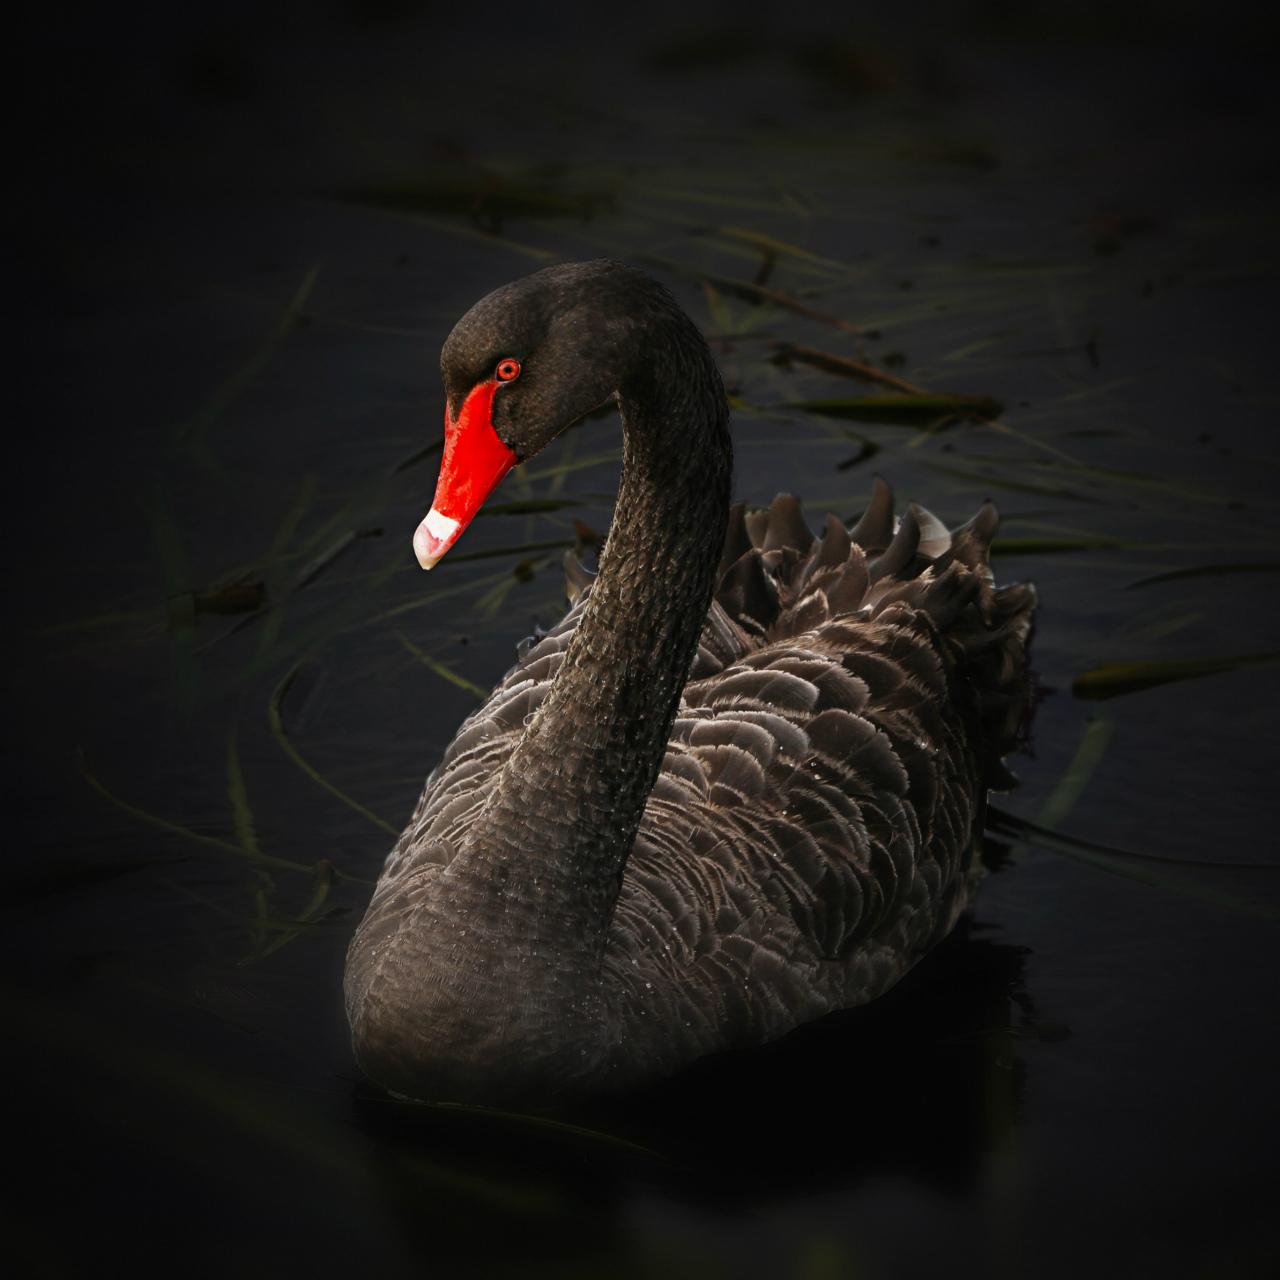 Black Swan wallpaper 1280x1280 1280x1280